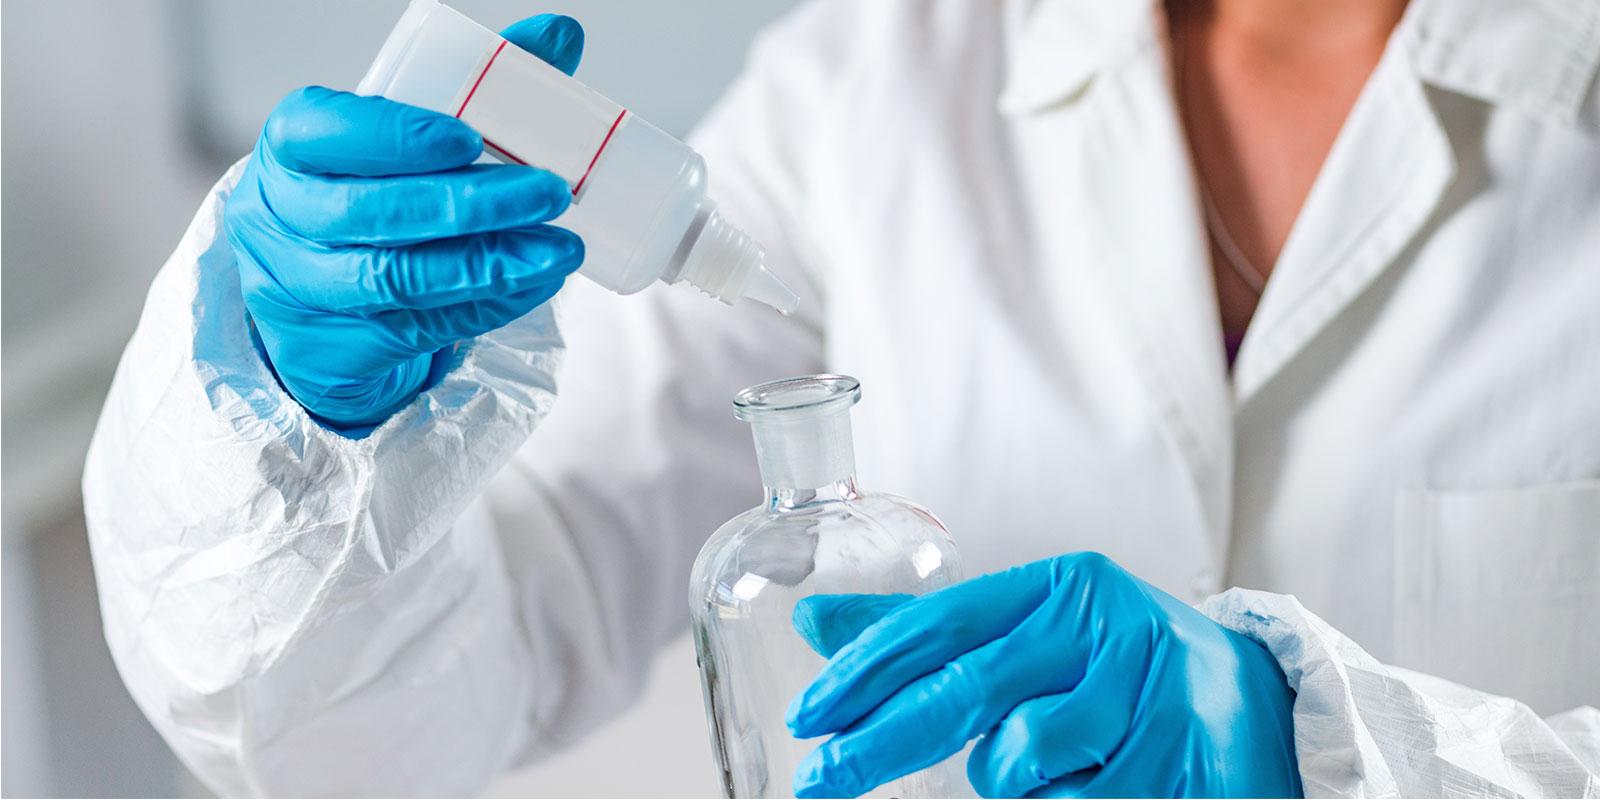 Laboratory   Environmental Health and Safety   Florida